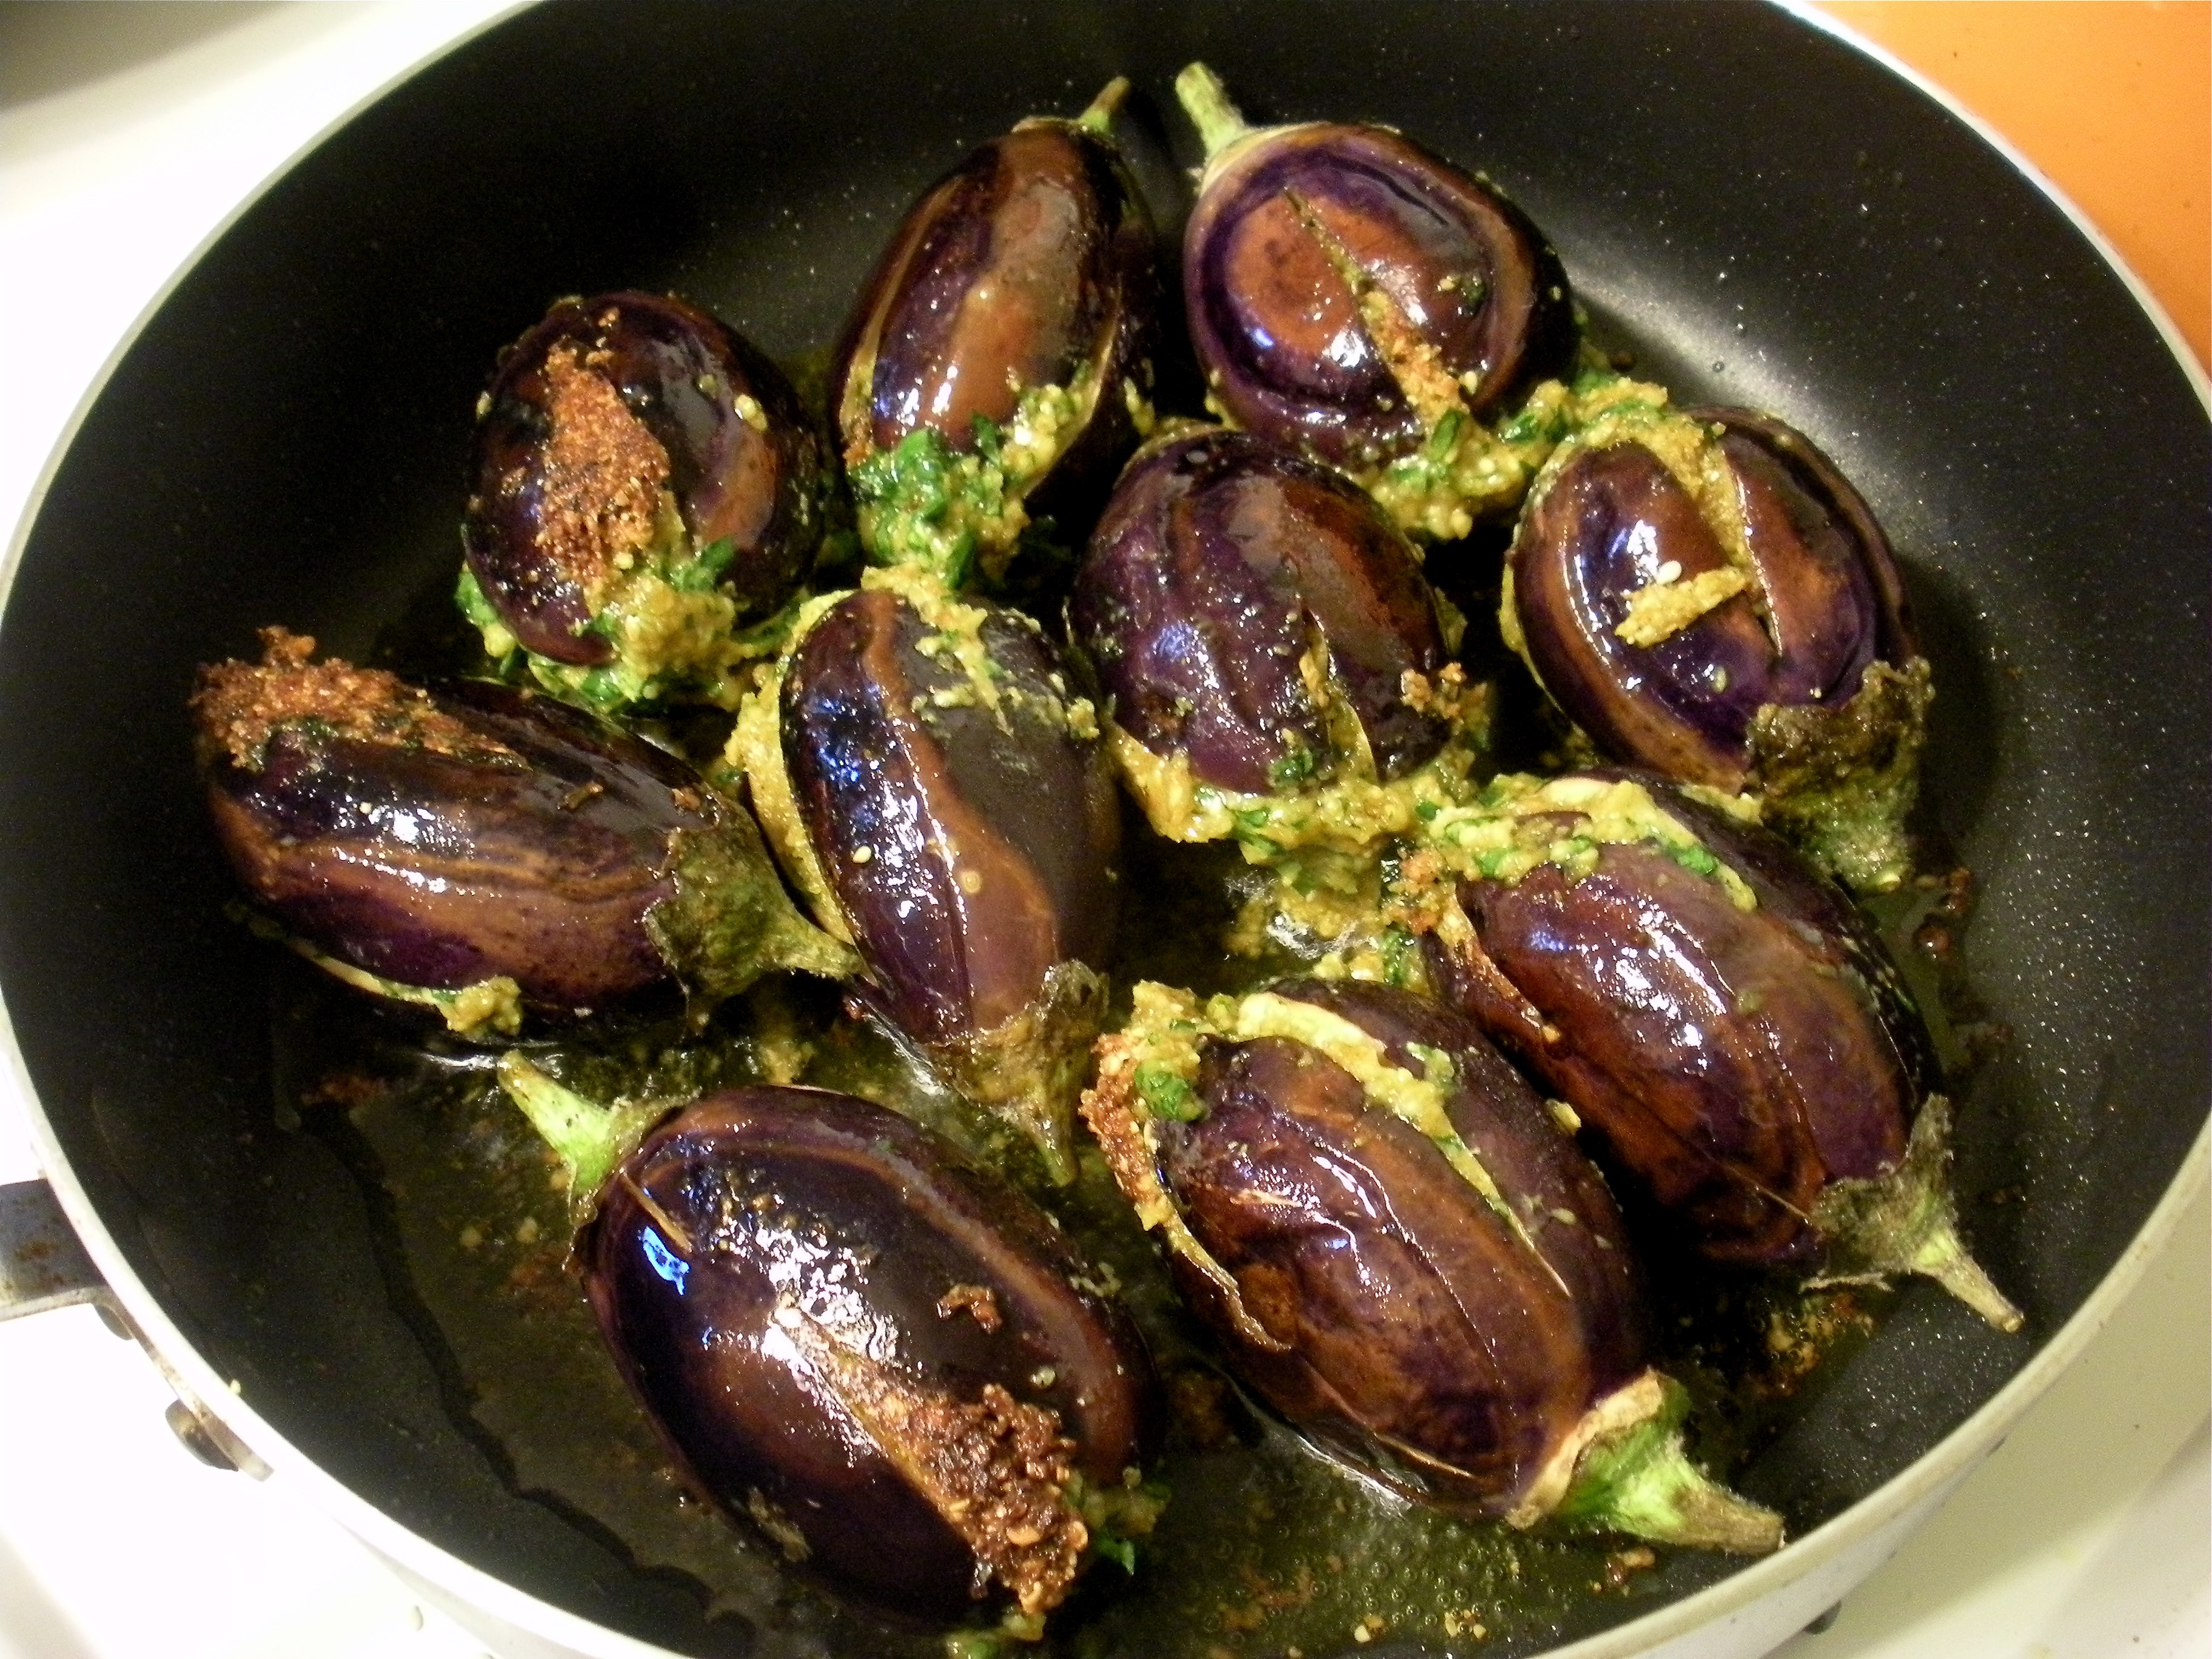 Indian Eggplant Recipes  Stuffed Indian Eggplant